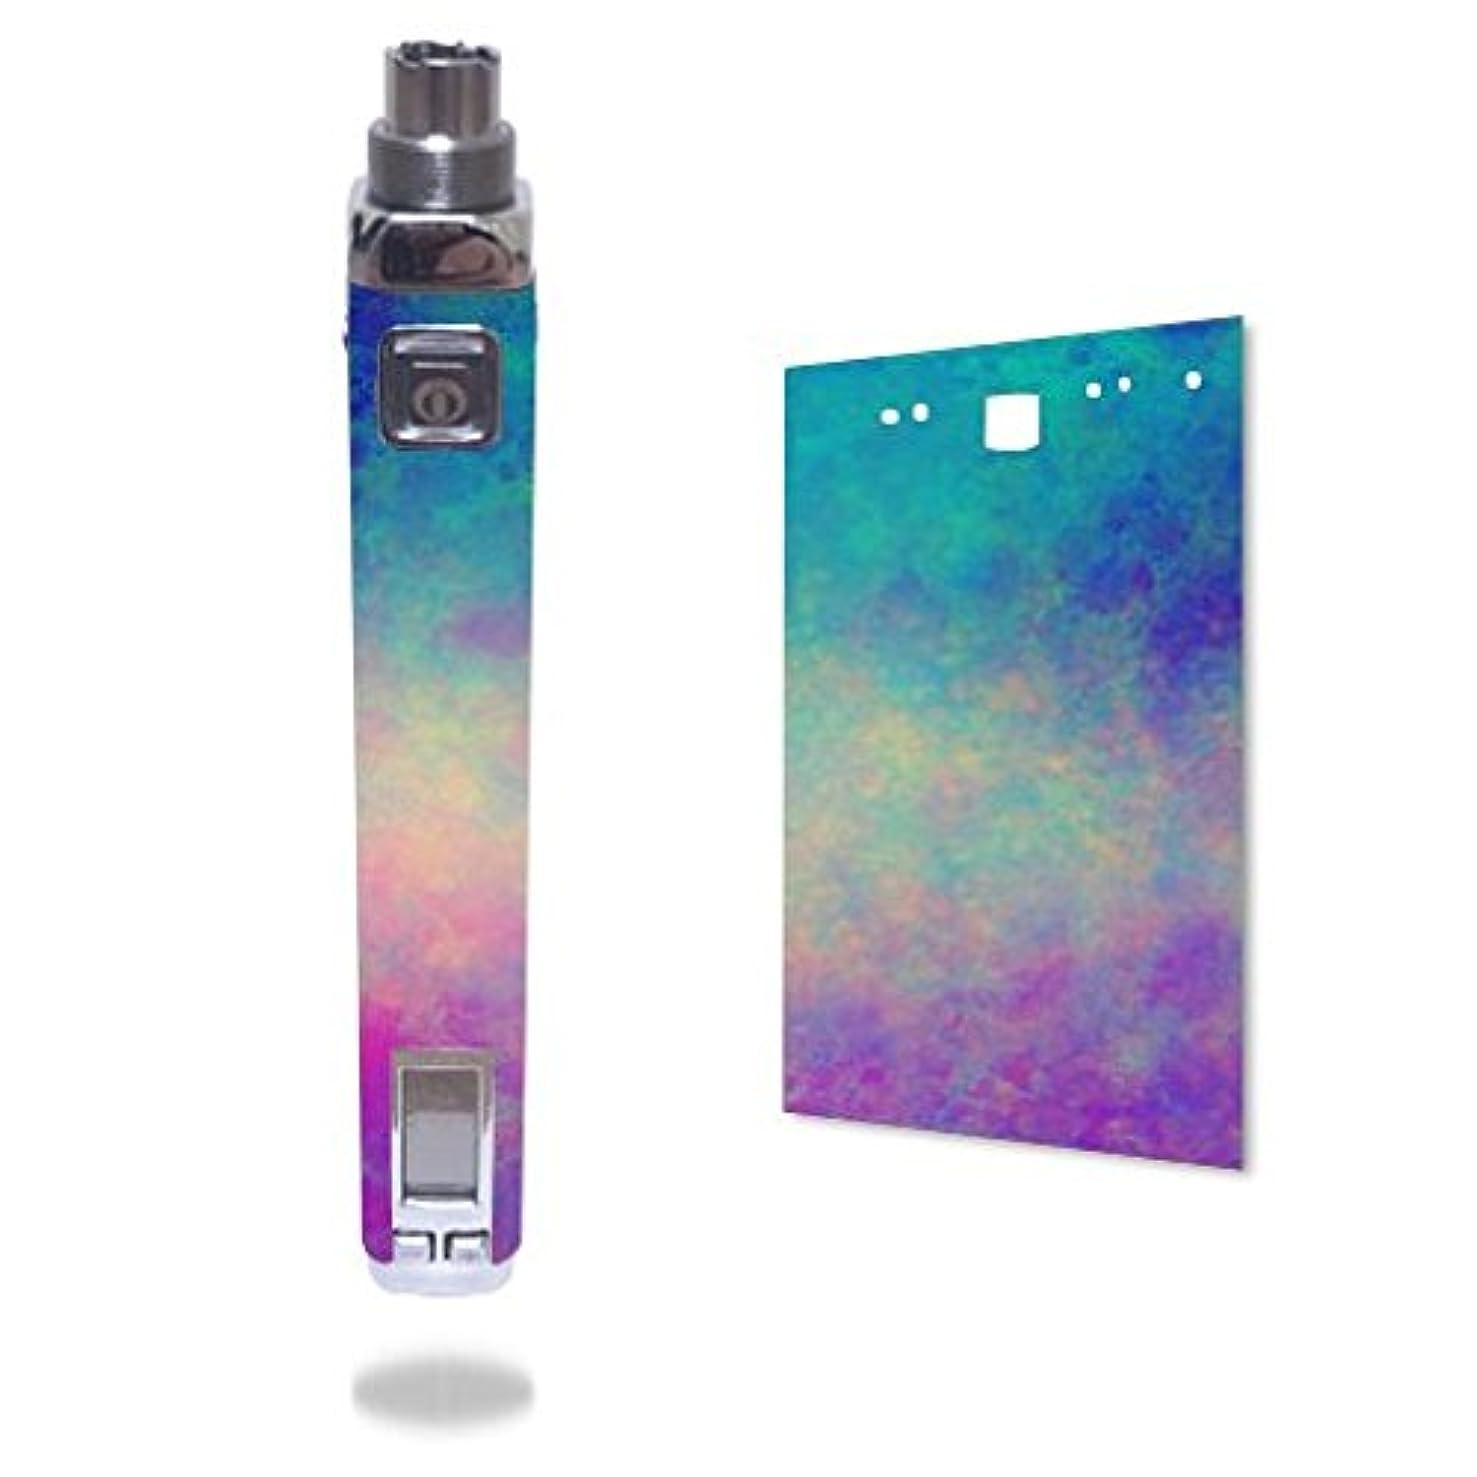 Decal Sticker Skin WRAP - Innokin iTaste VV V3.0 - Colorful Design Marble Texture